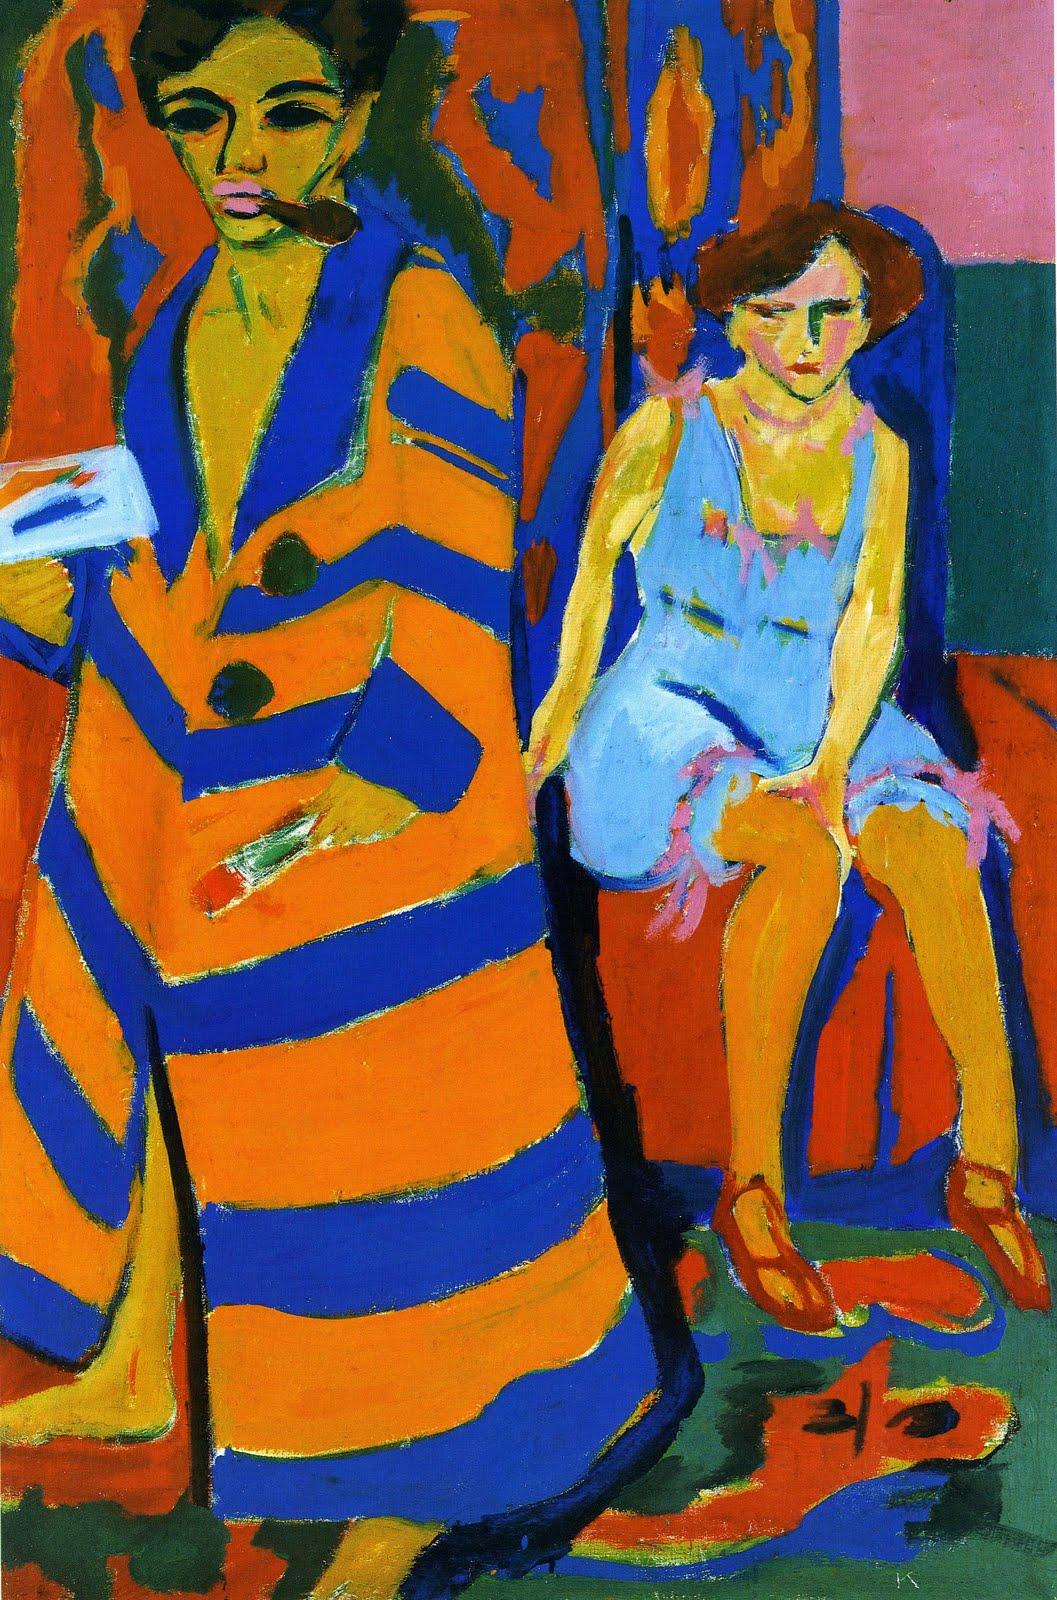 Open window matisse - Viewing Gallery For Matisse Self Portraits